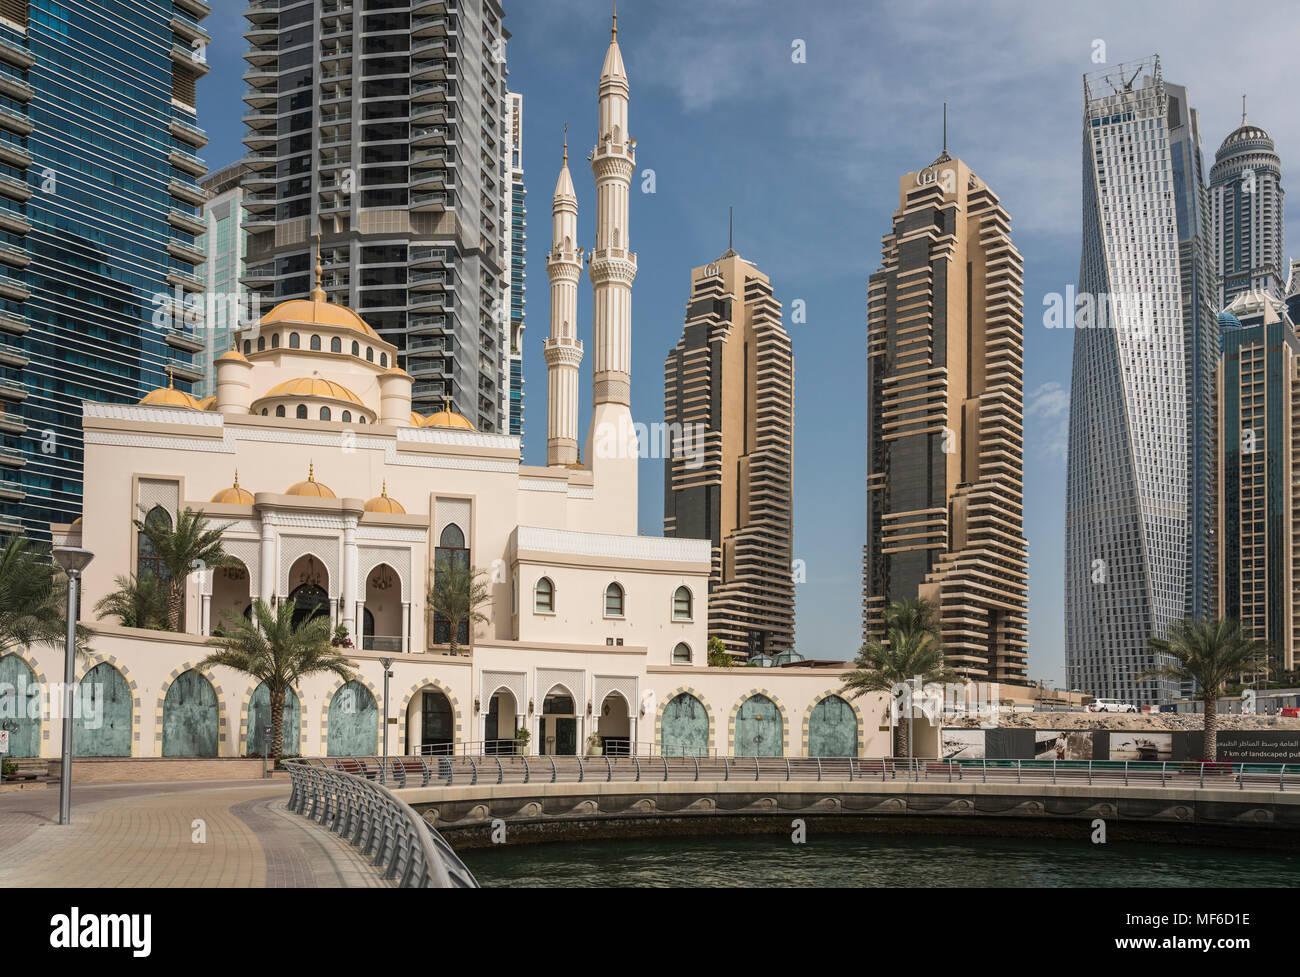 The Al Raheem mosque in the marina of Dubai, UAE, Middle East. - Stock Image